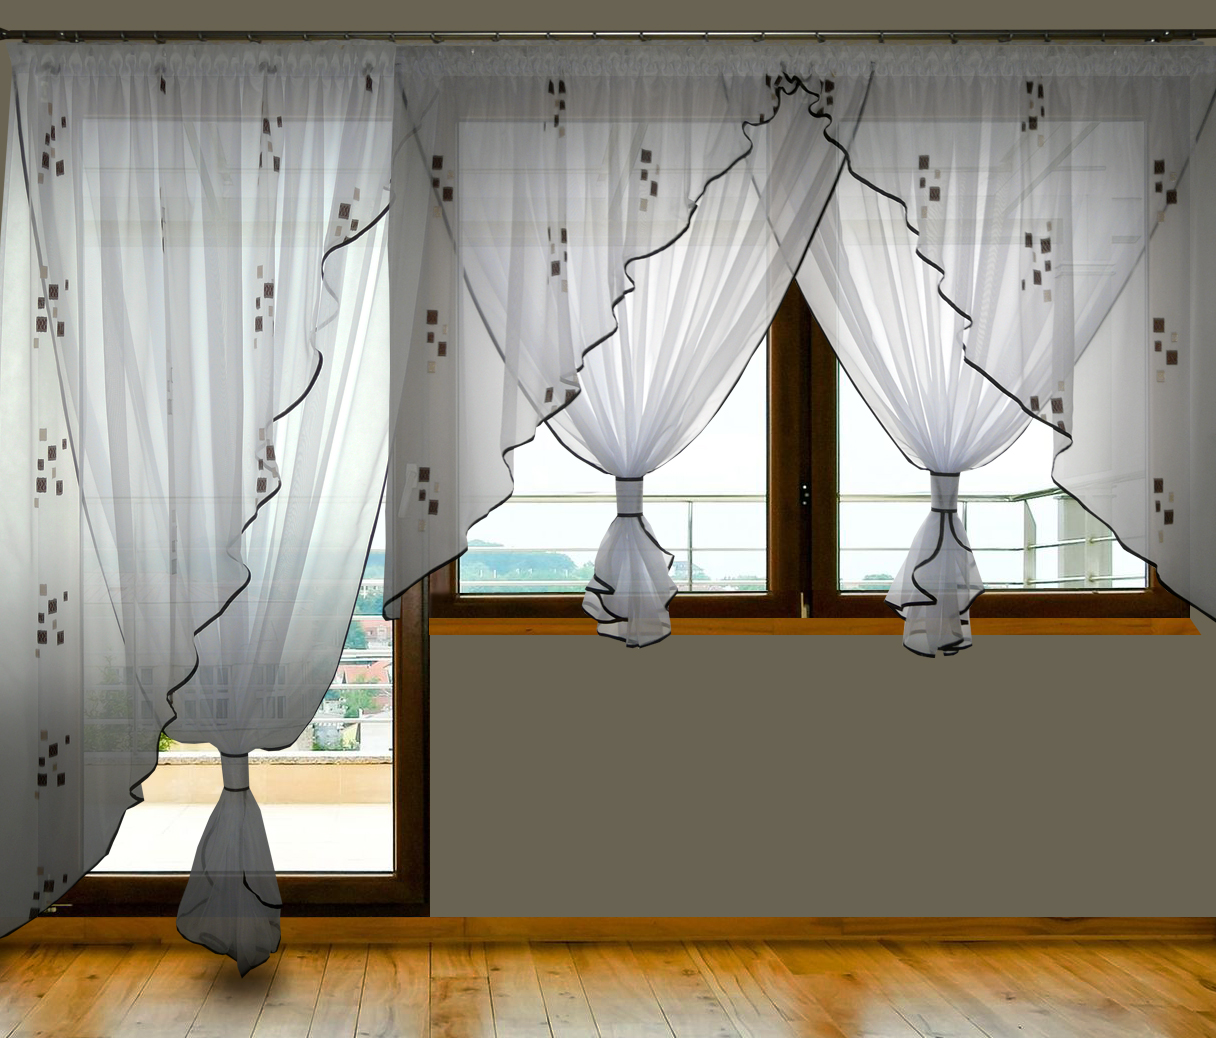 ag21a fertiggardine aus voile neu design balkont r sch ne. Black Bedroom Furniture Sets. Home Design Ideas